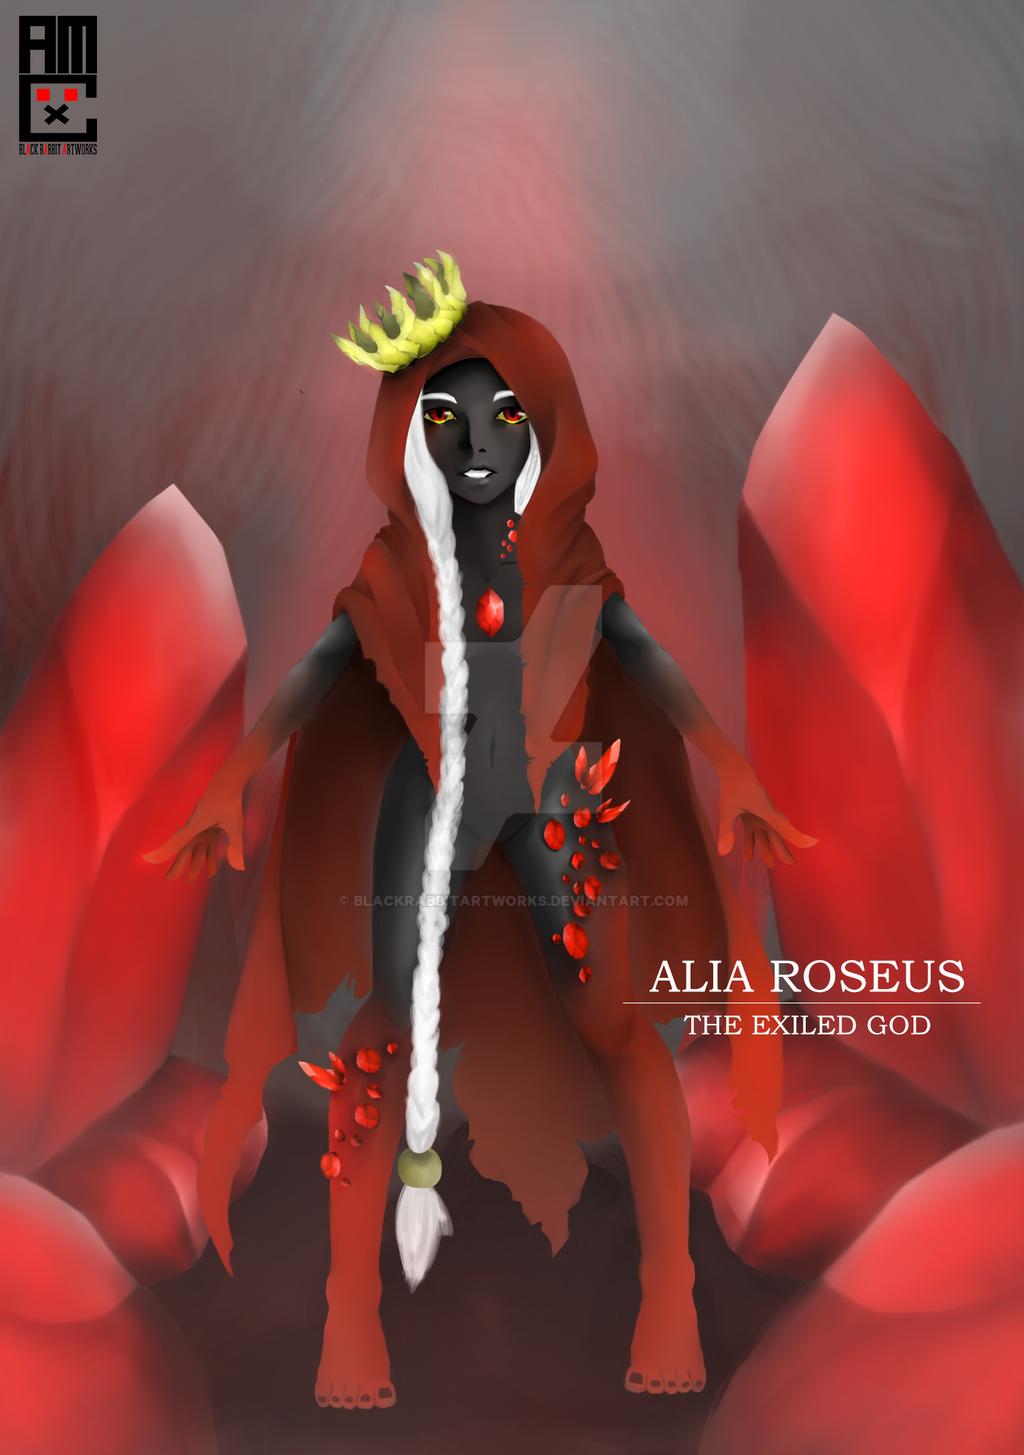 Alia Roseus - Exiled God by blackrabbitartworks